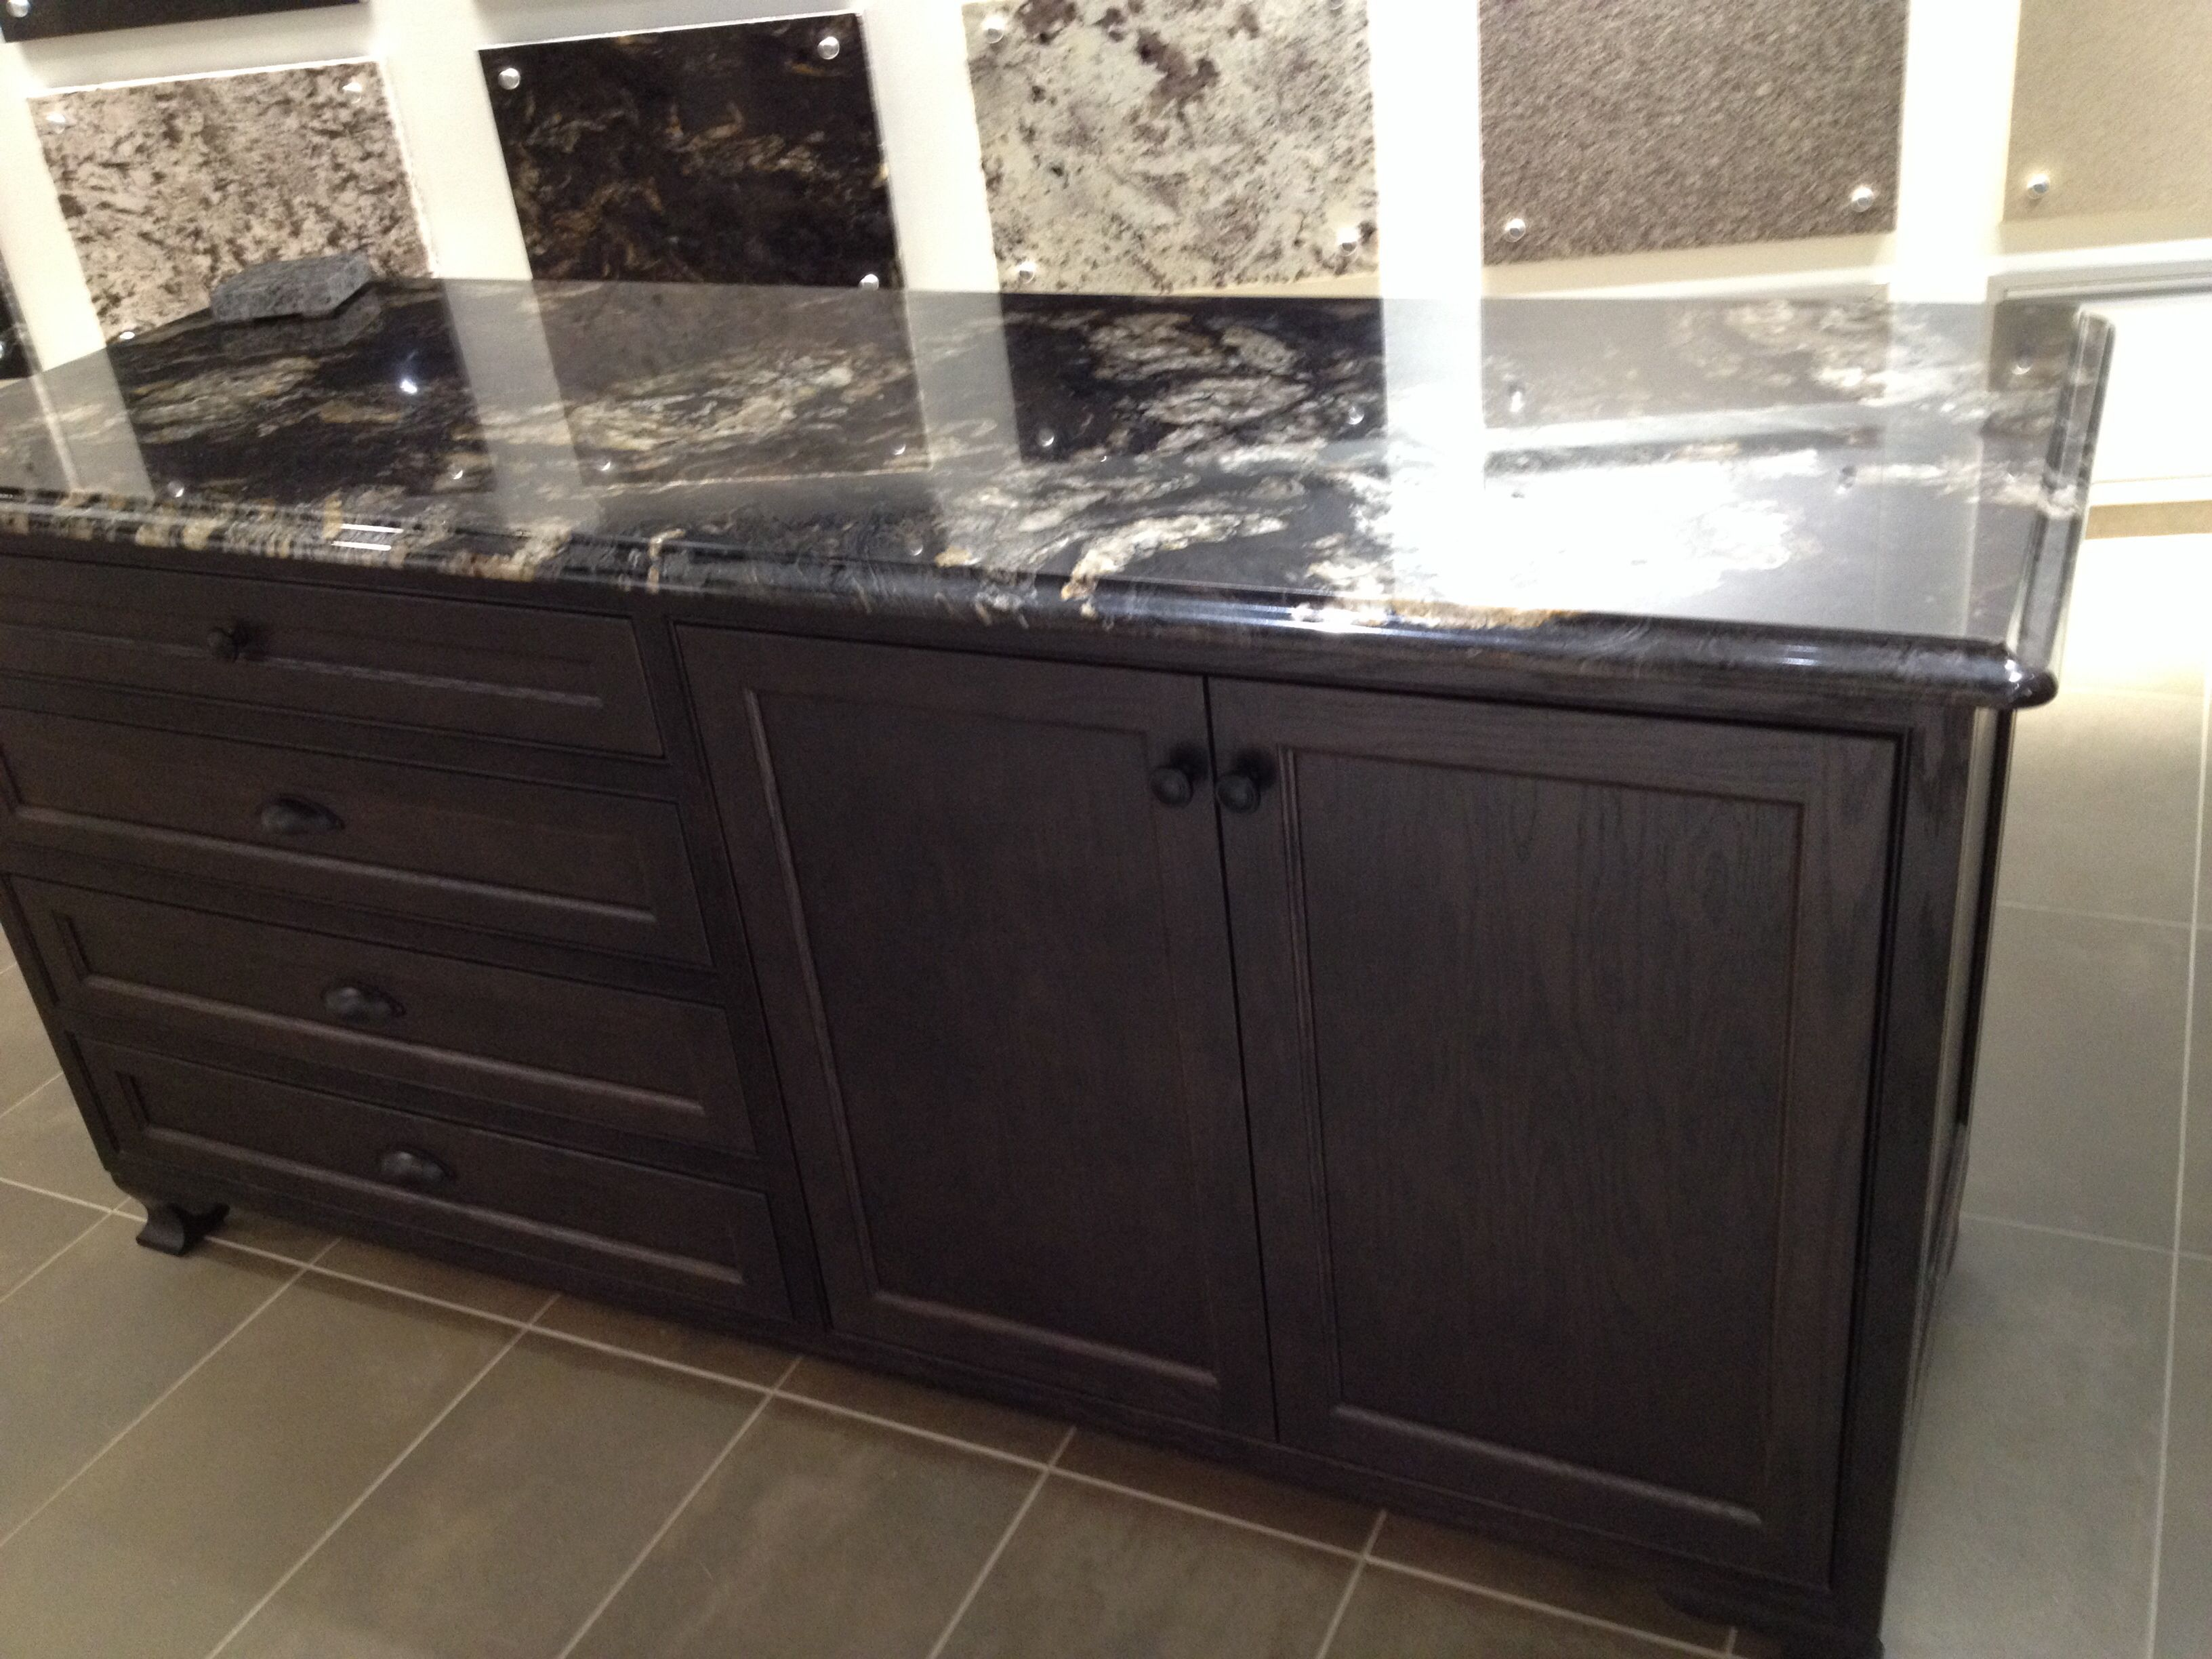 BLack titanium granite with dark brown cabinets | Black ... on Black Granite Countertops With Brown Cabinets  id=60957